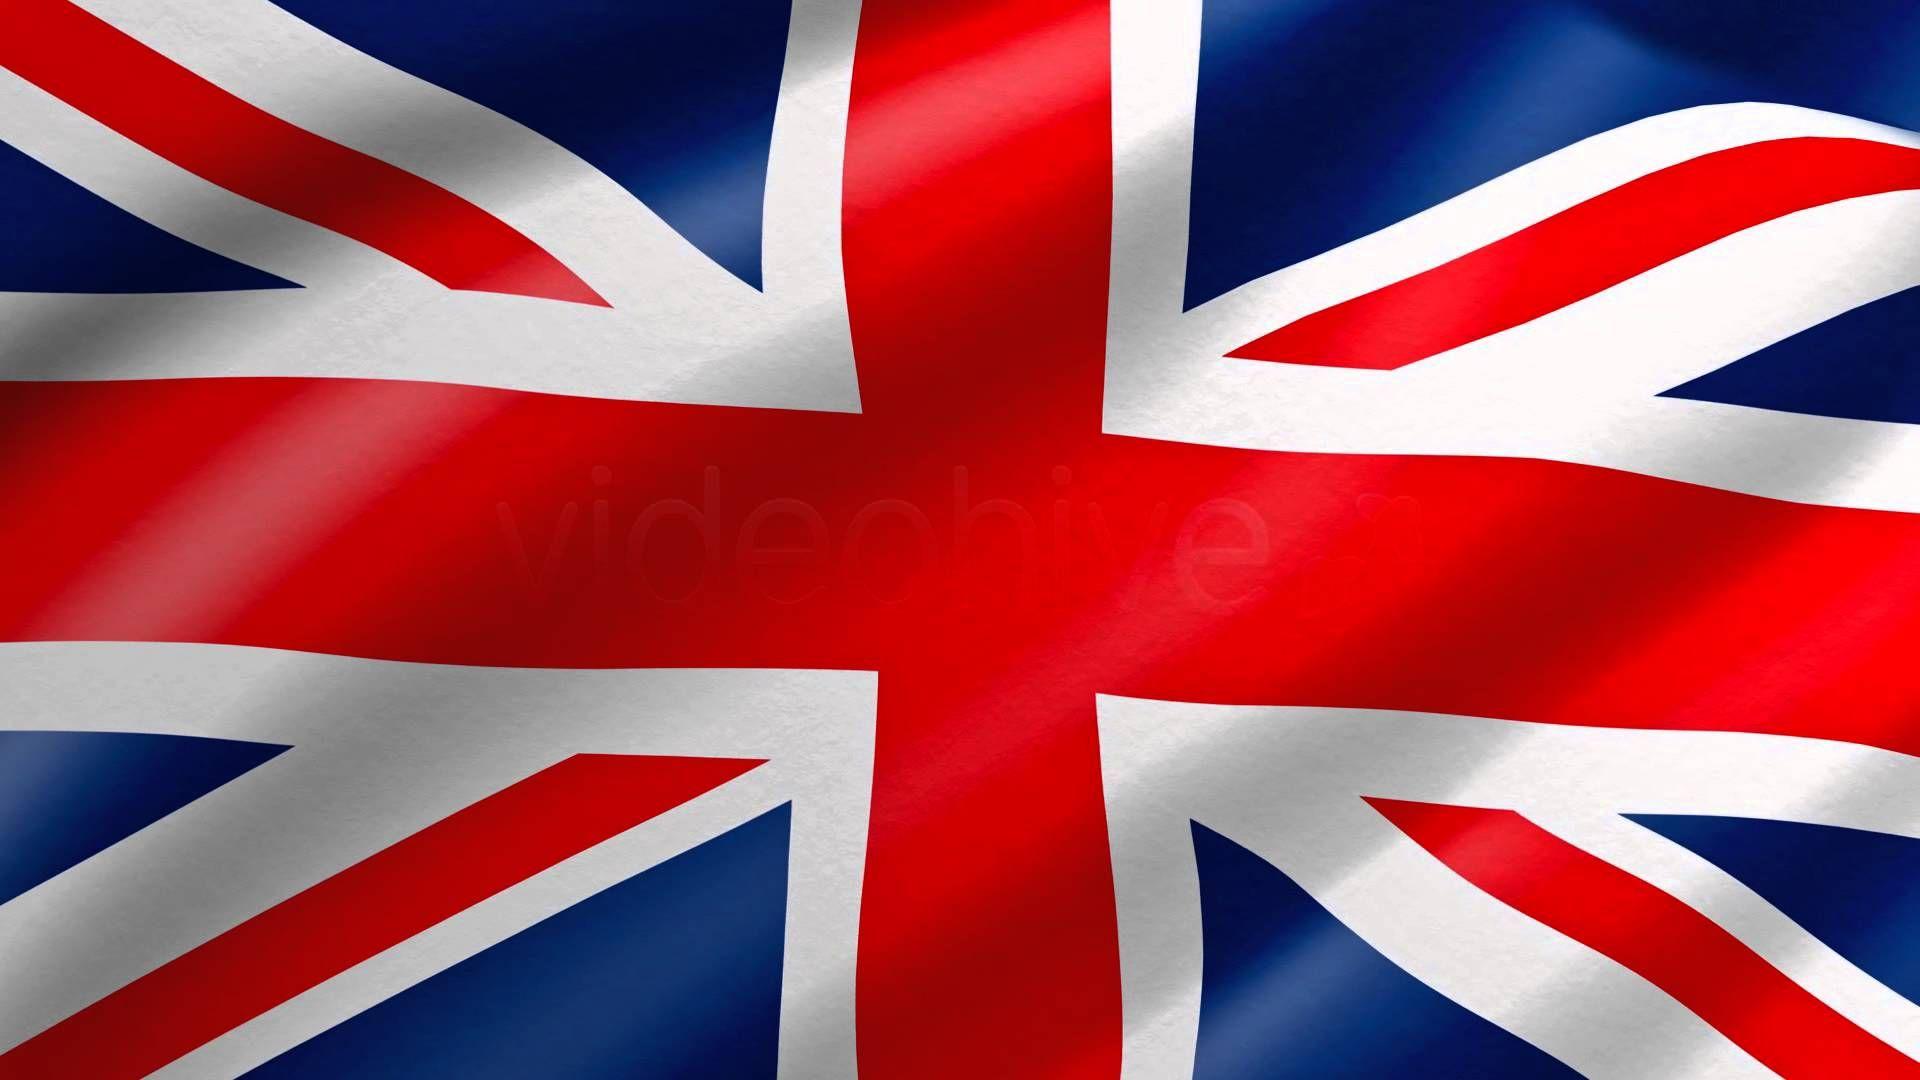 Uk United Kingdom Flag Waving Loop 4k Youtube United Kingdom Flag Flags Of The World Flag